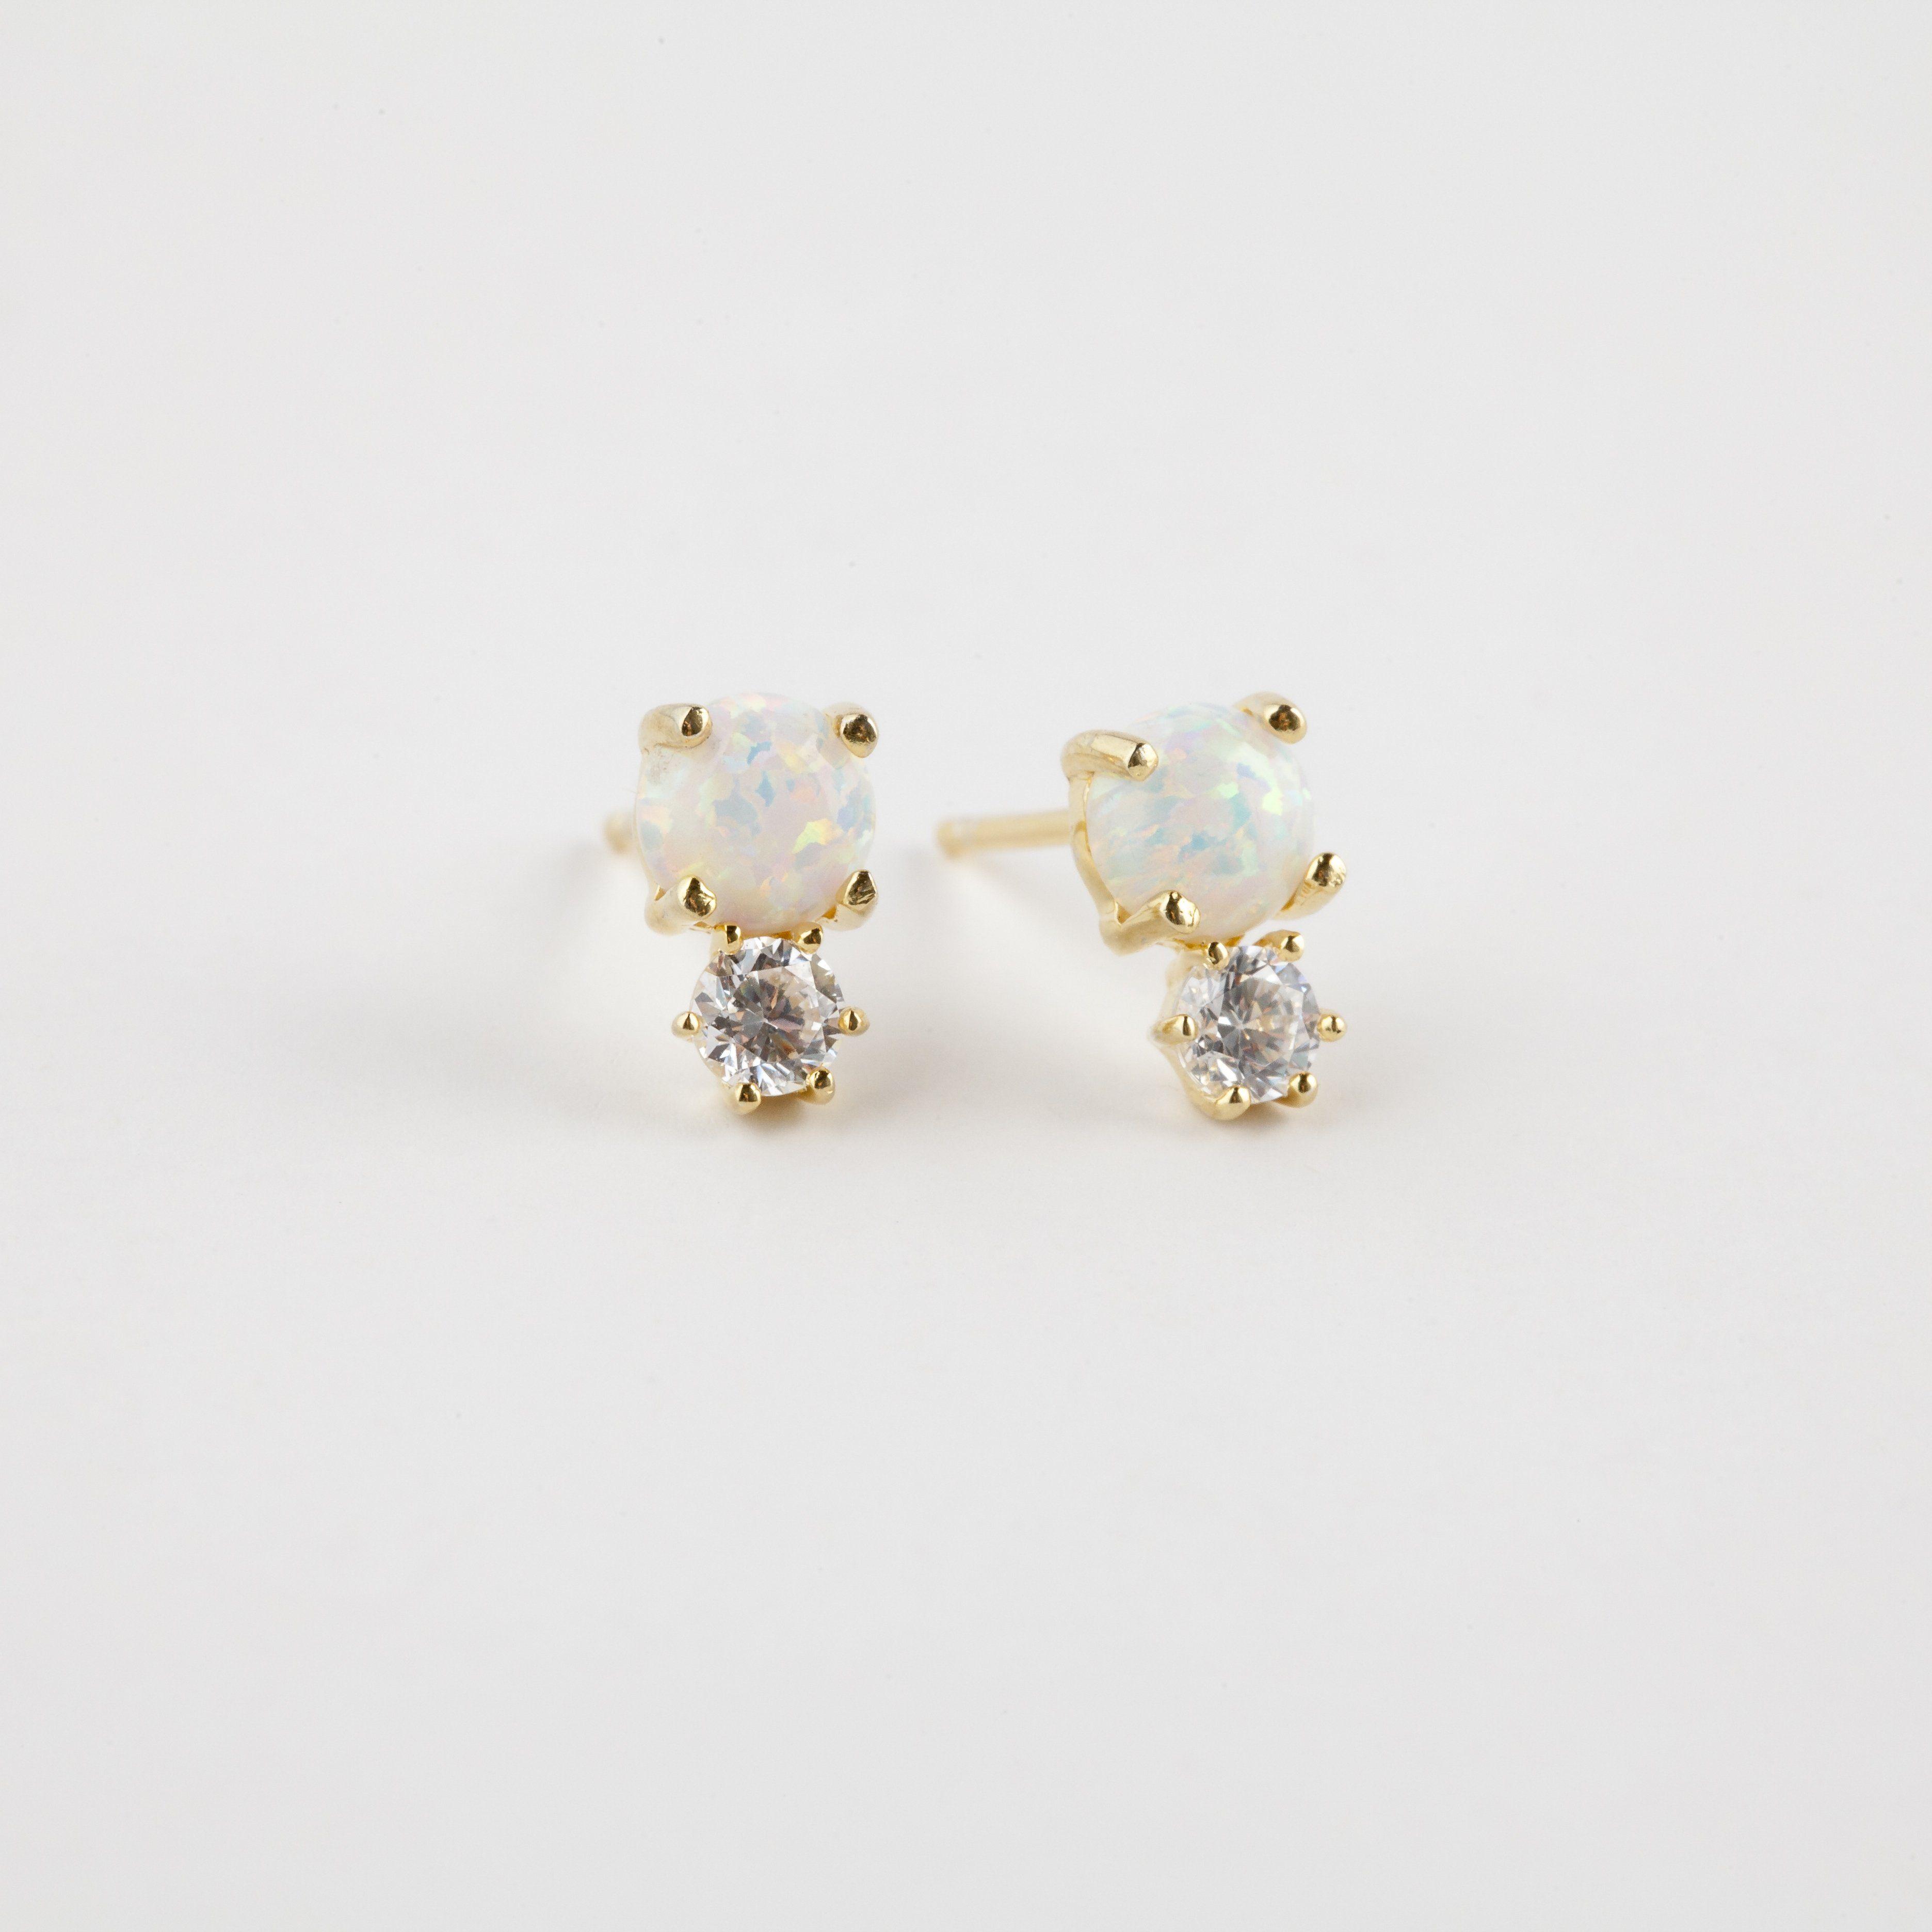 18kt Gold Vermeil2 Simulated Diamonds2 Genuine Opalssterling Silver Ear Posts For Sensitive Ears